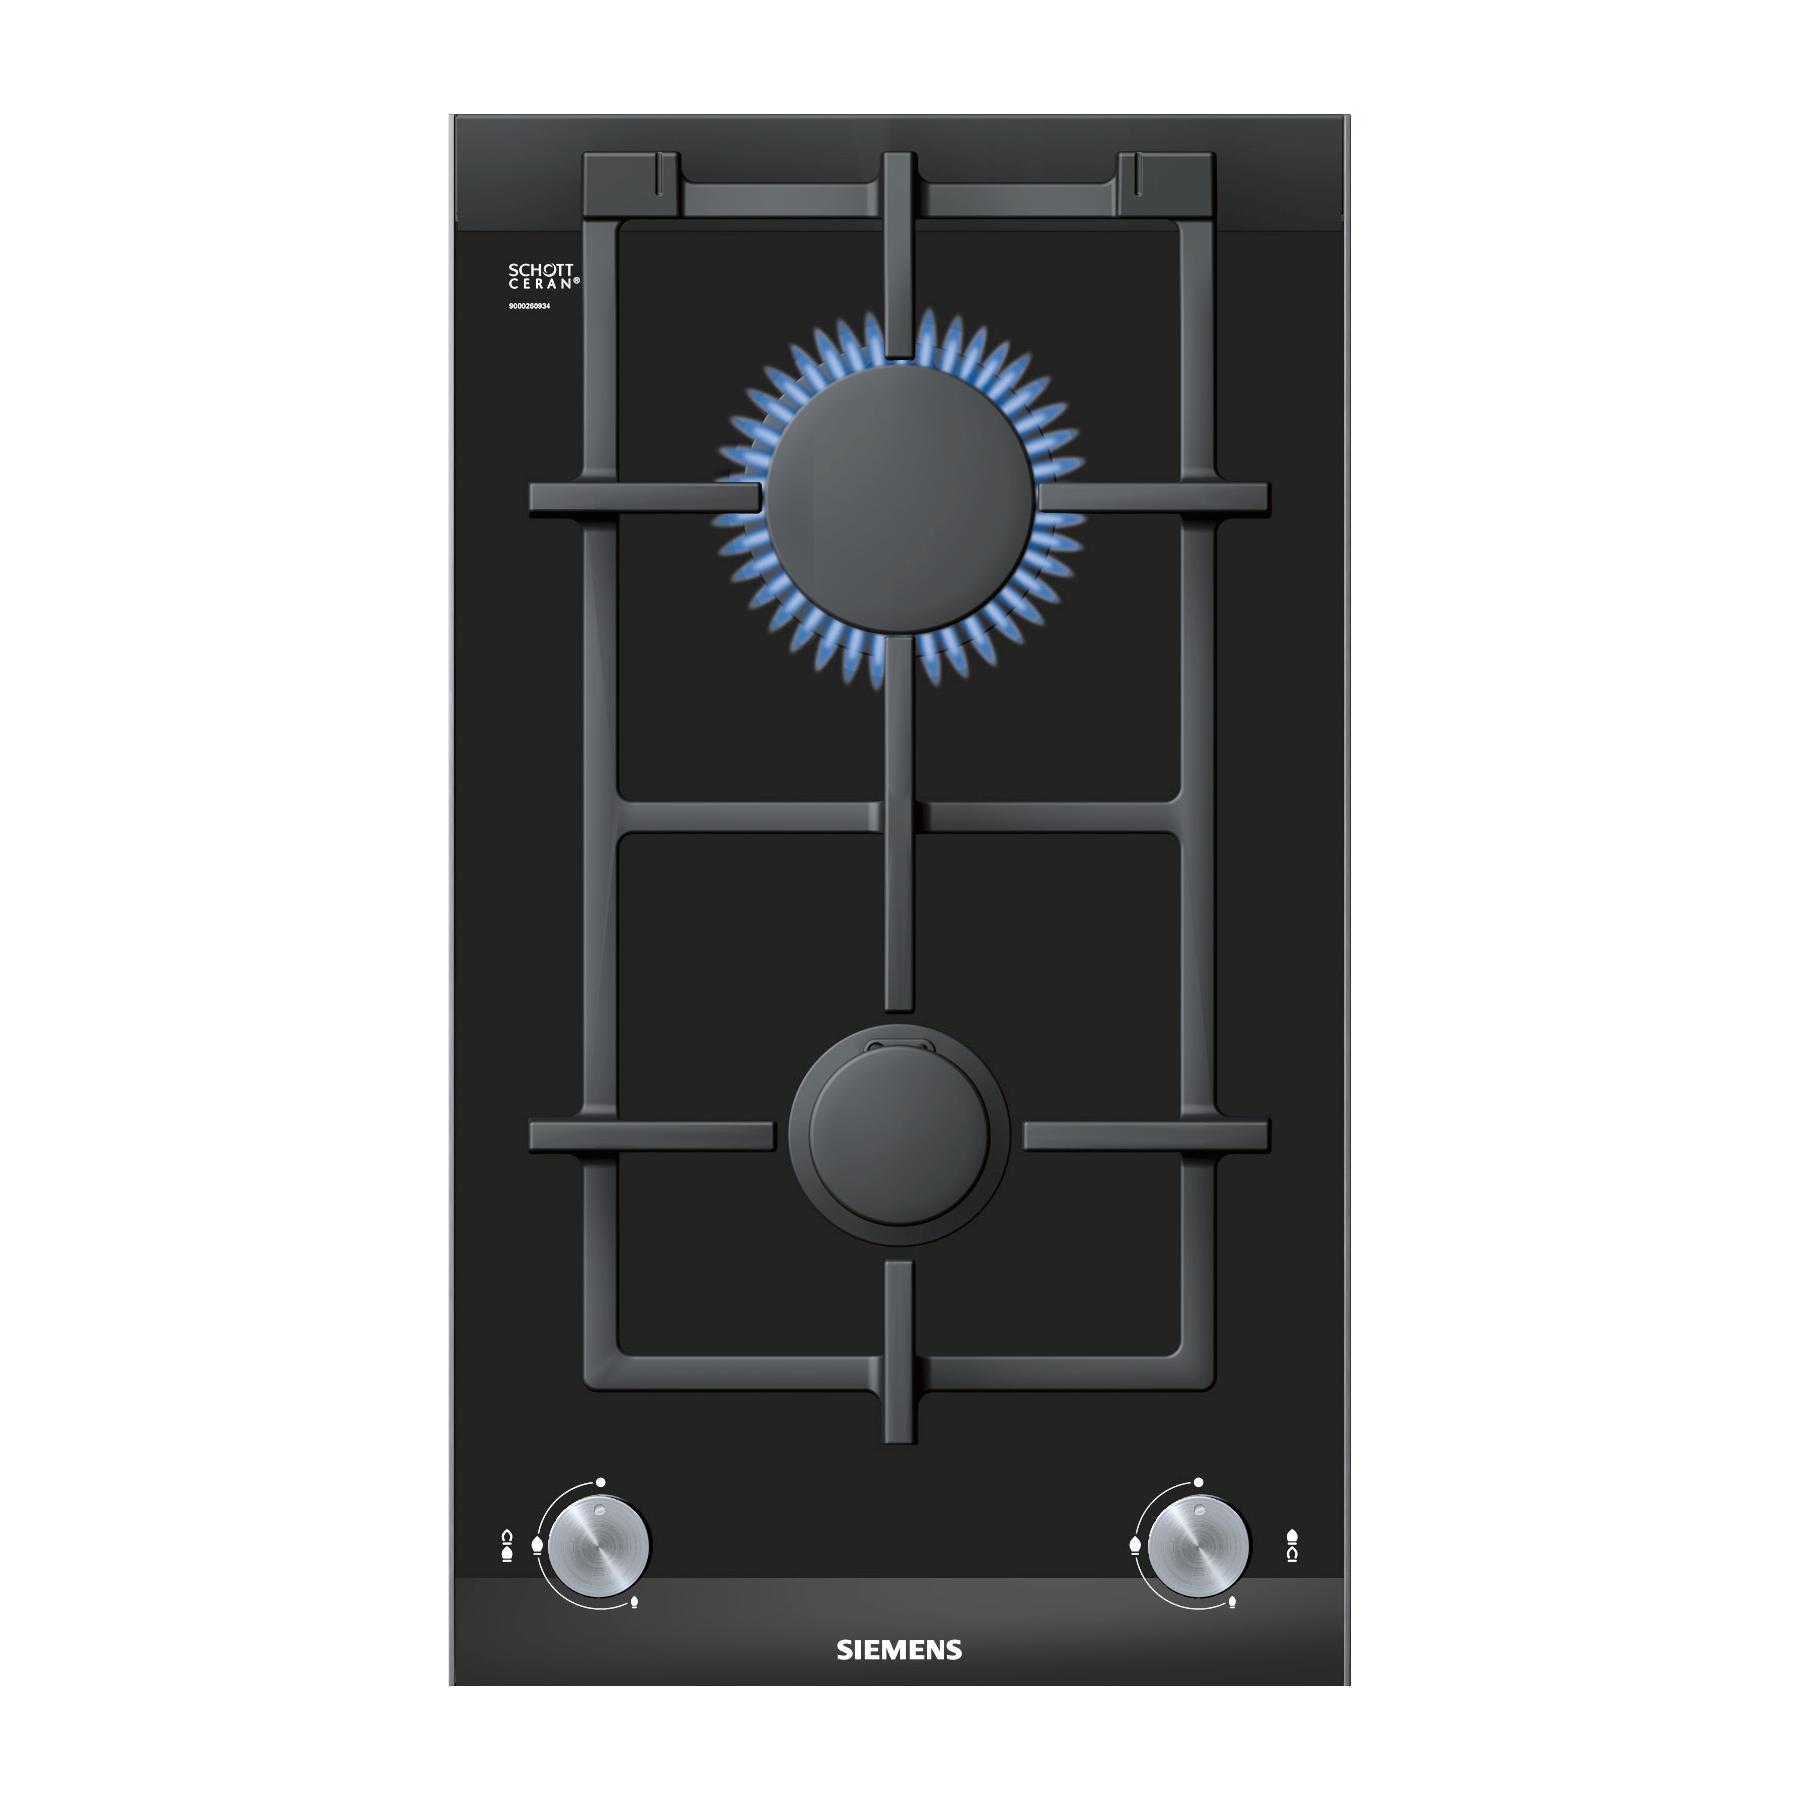 siemens er326bb70e iq700 domino gas hob ex display. Black Bedroom Furniture Sets. Home Design Ideas